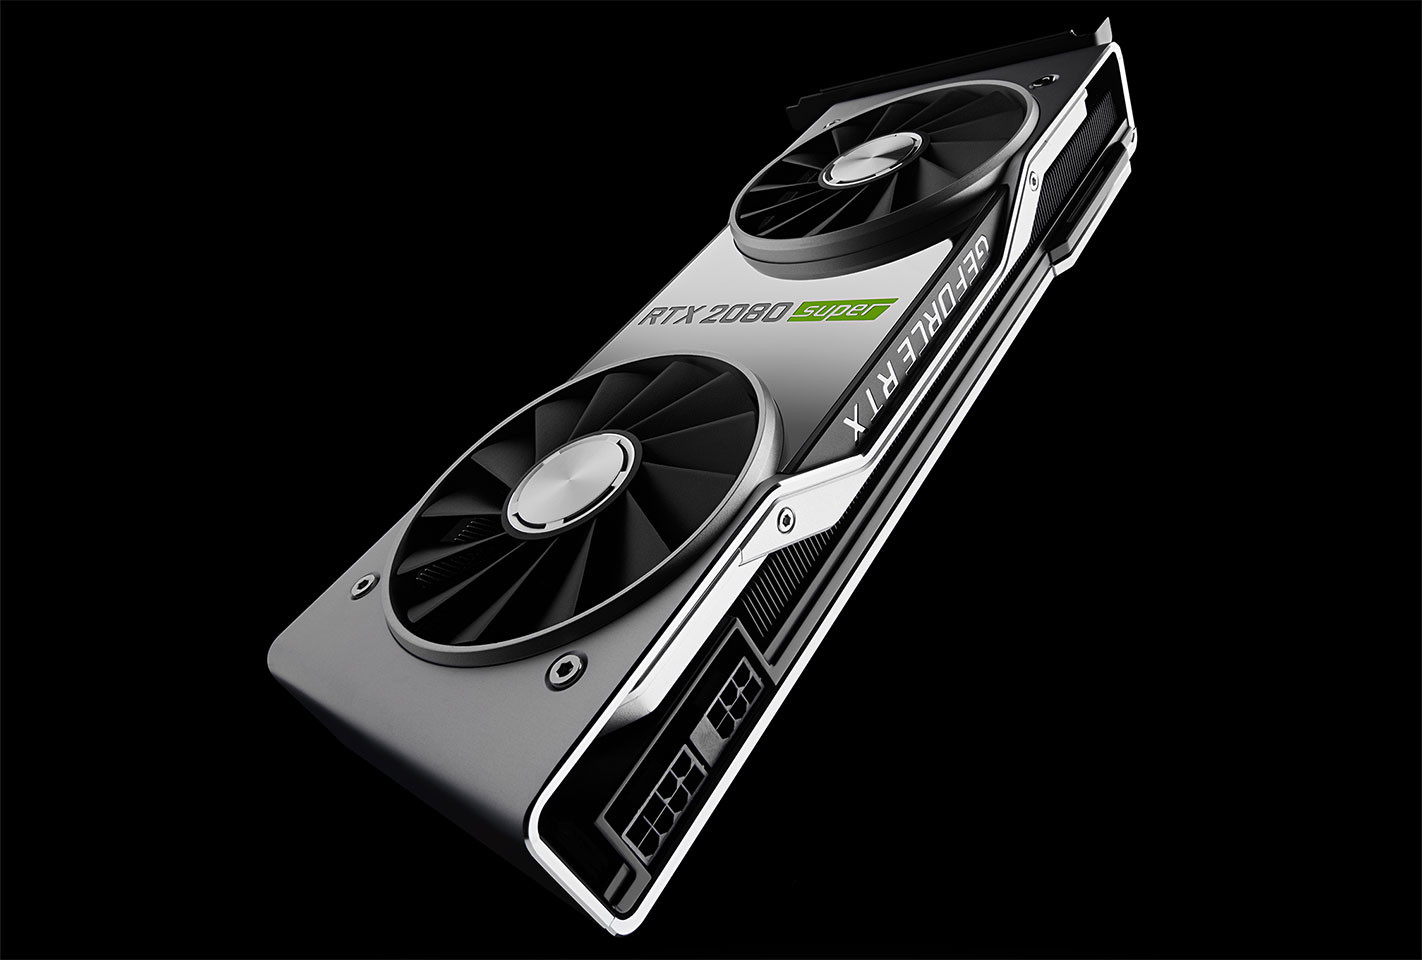 Image 2 : La GeForce RTX 2080 Super talonne la Titan V dans le bench FF XV !